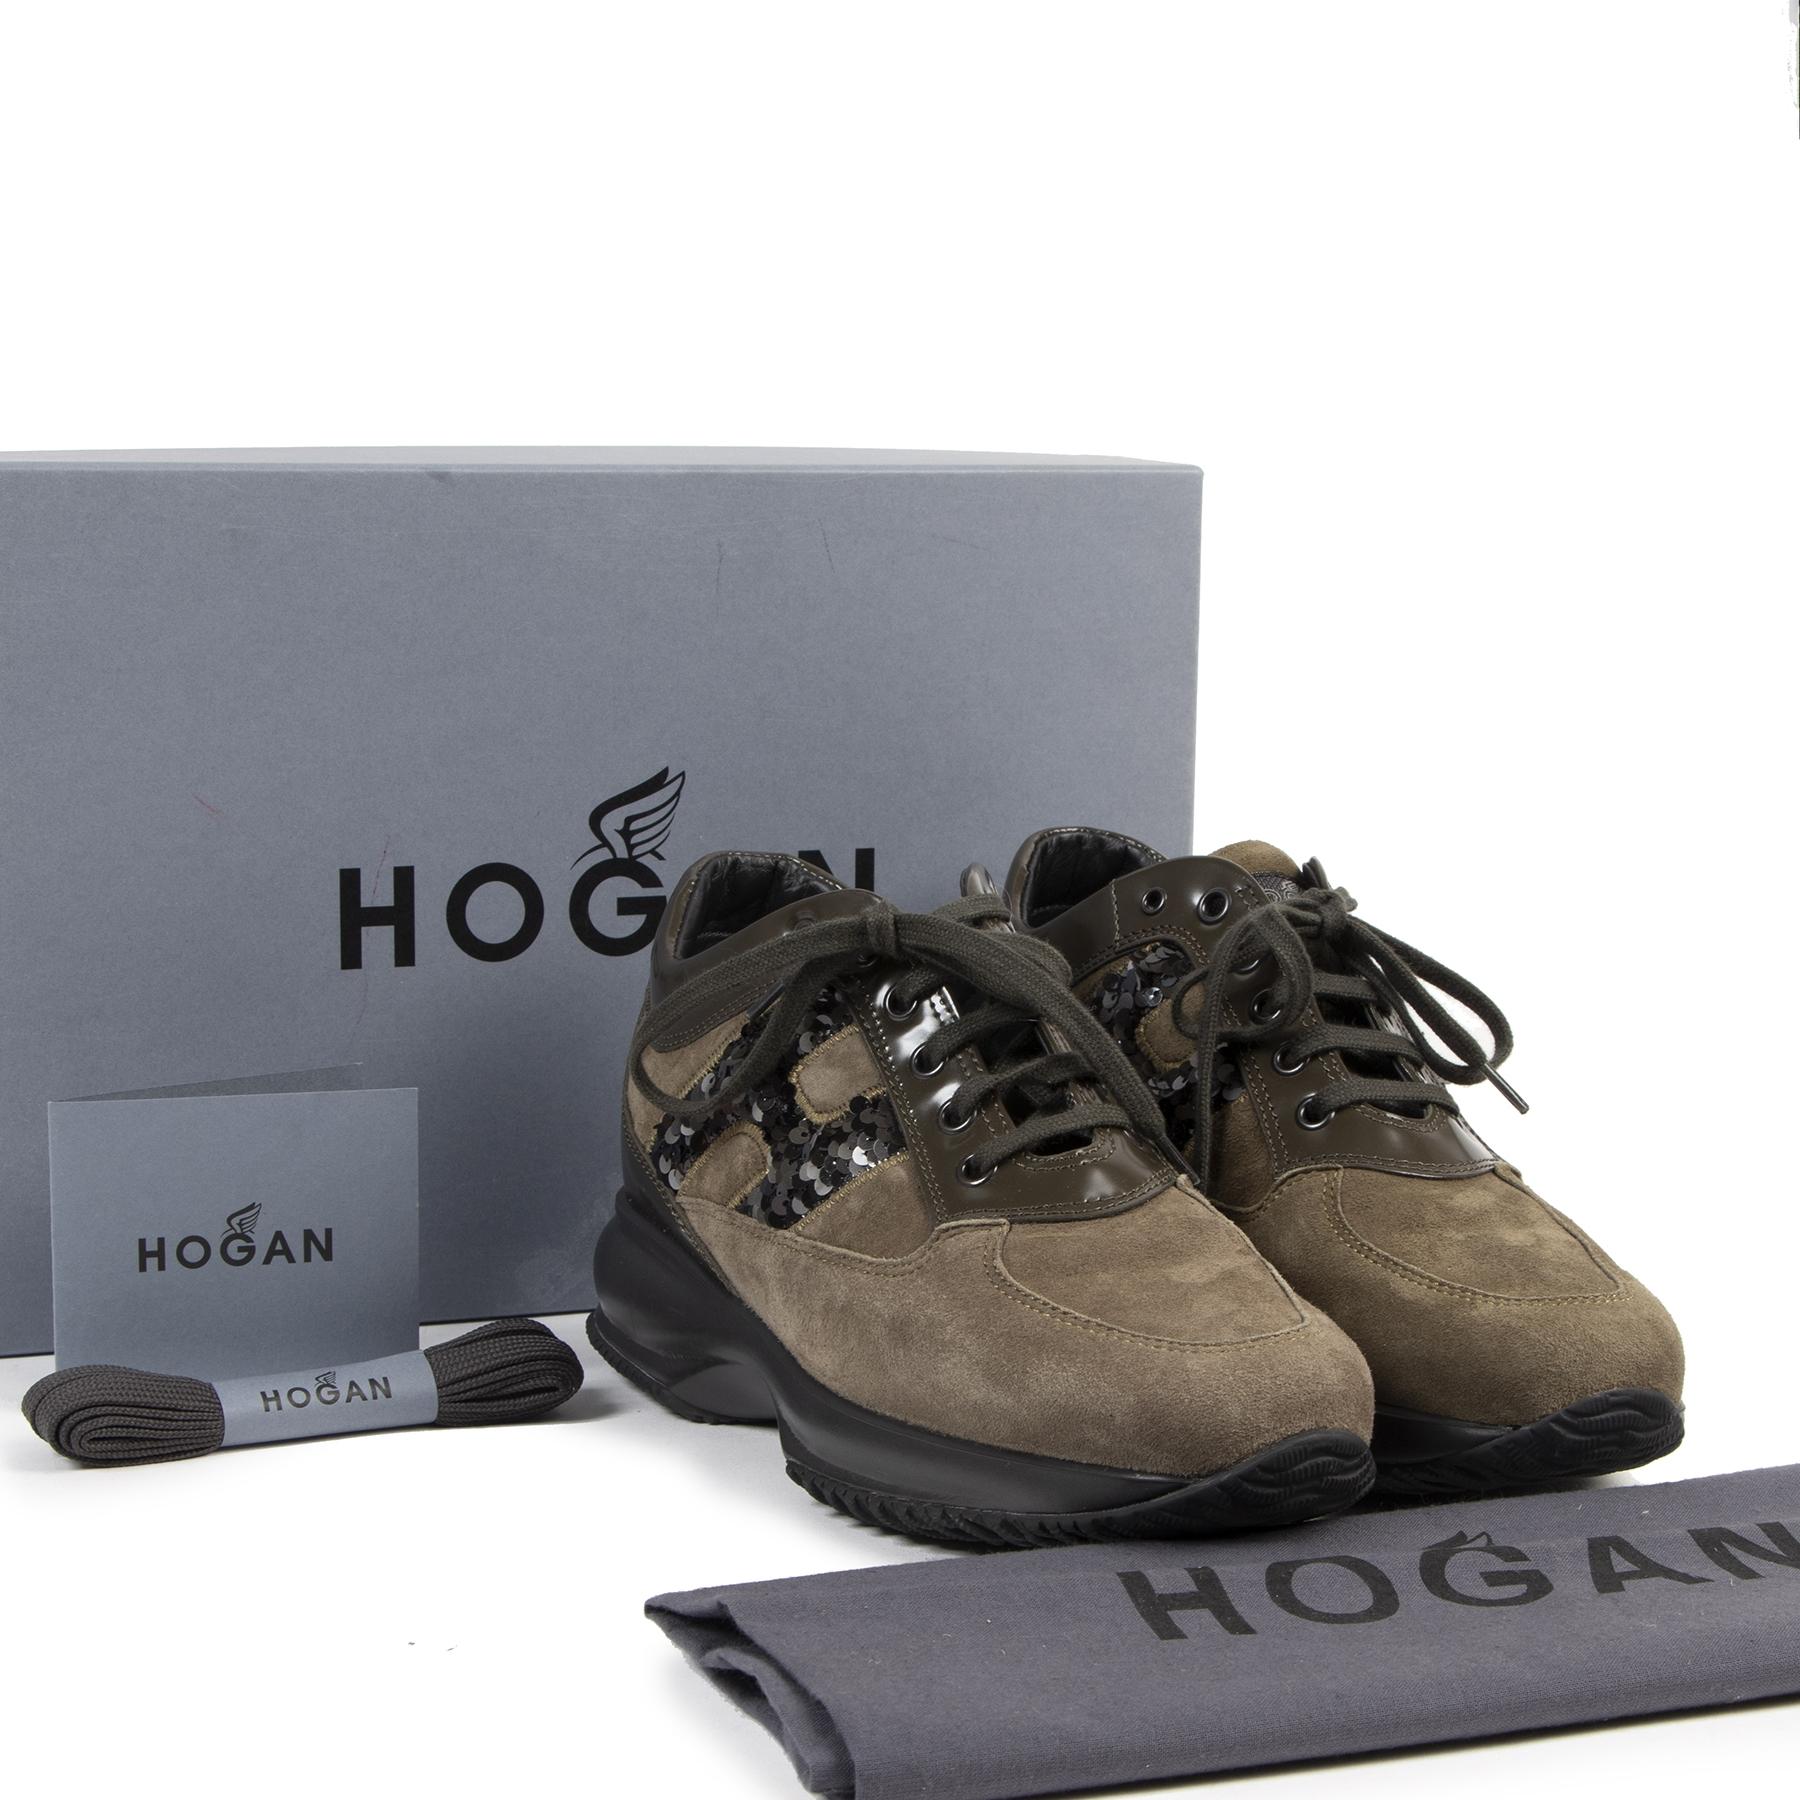 acheter en ligne seconde Hogan Interactive Khaki Sneakers - Size 38,5